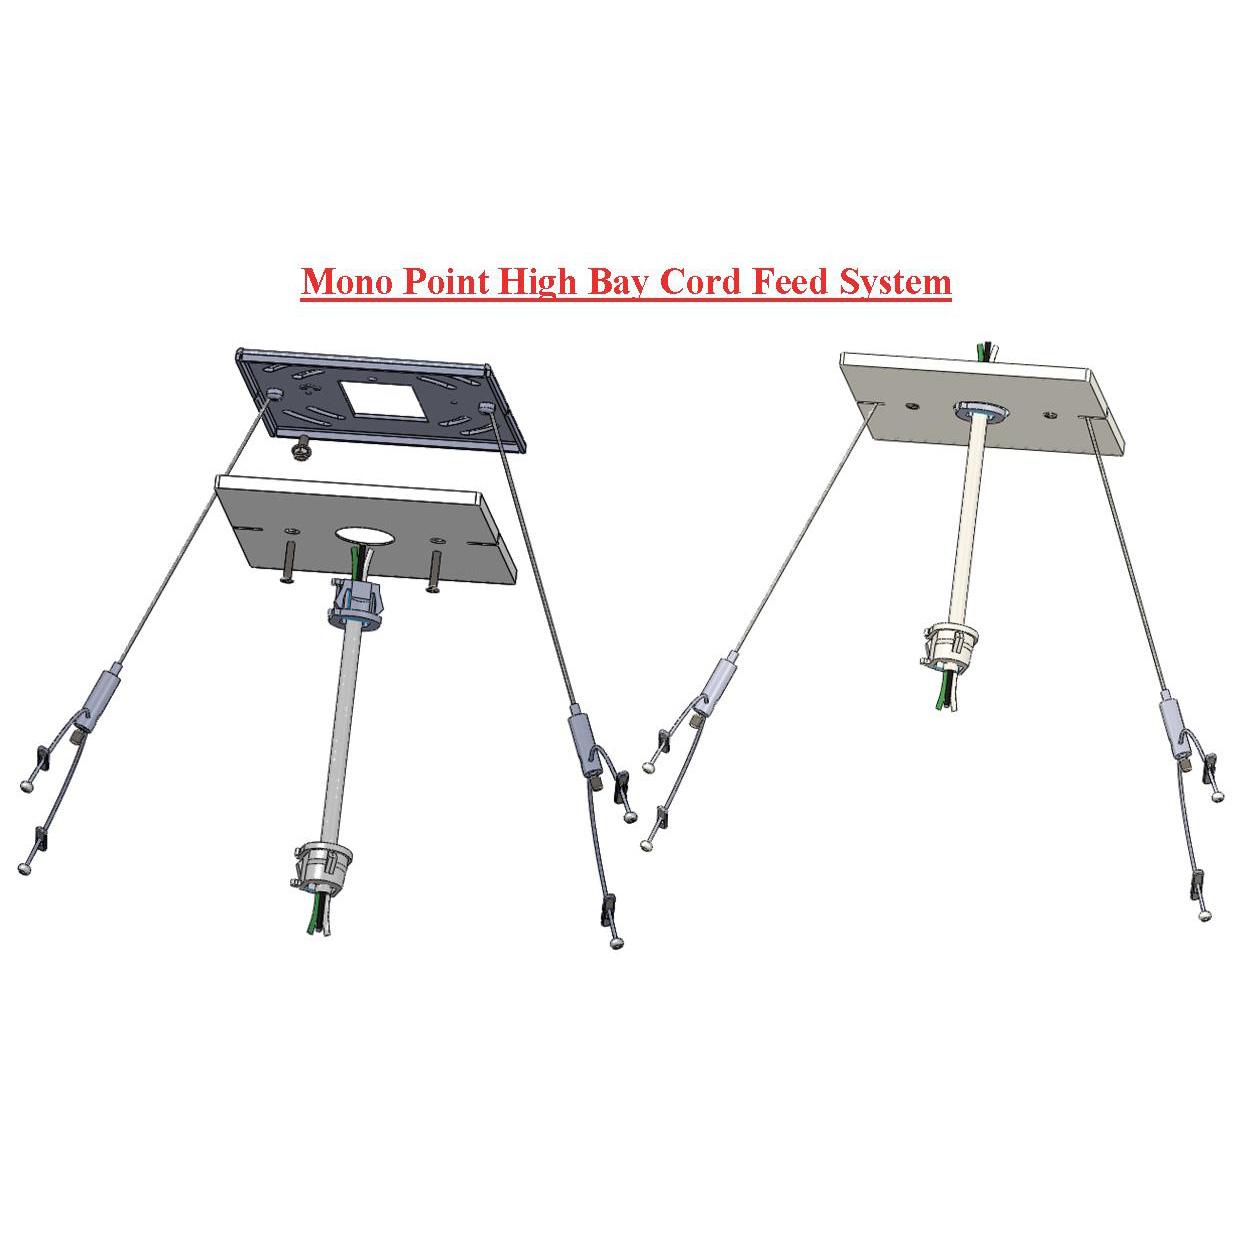 MONO POINT High Bay Feed Series